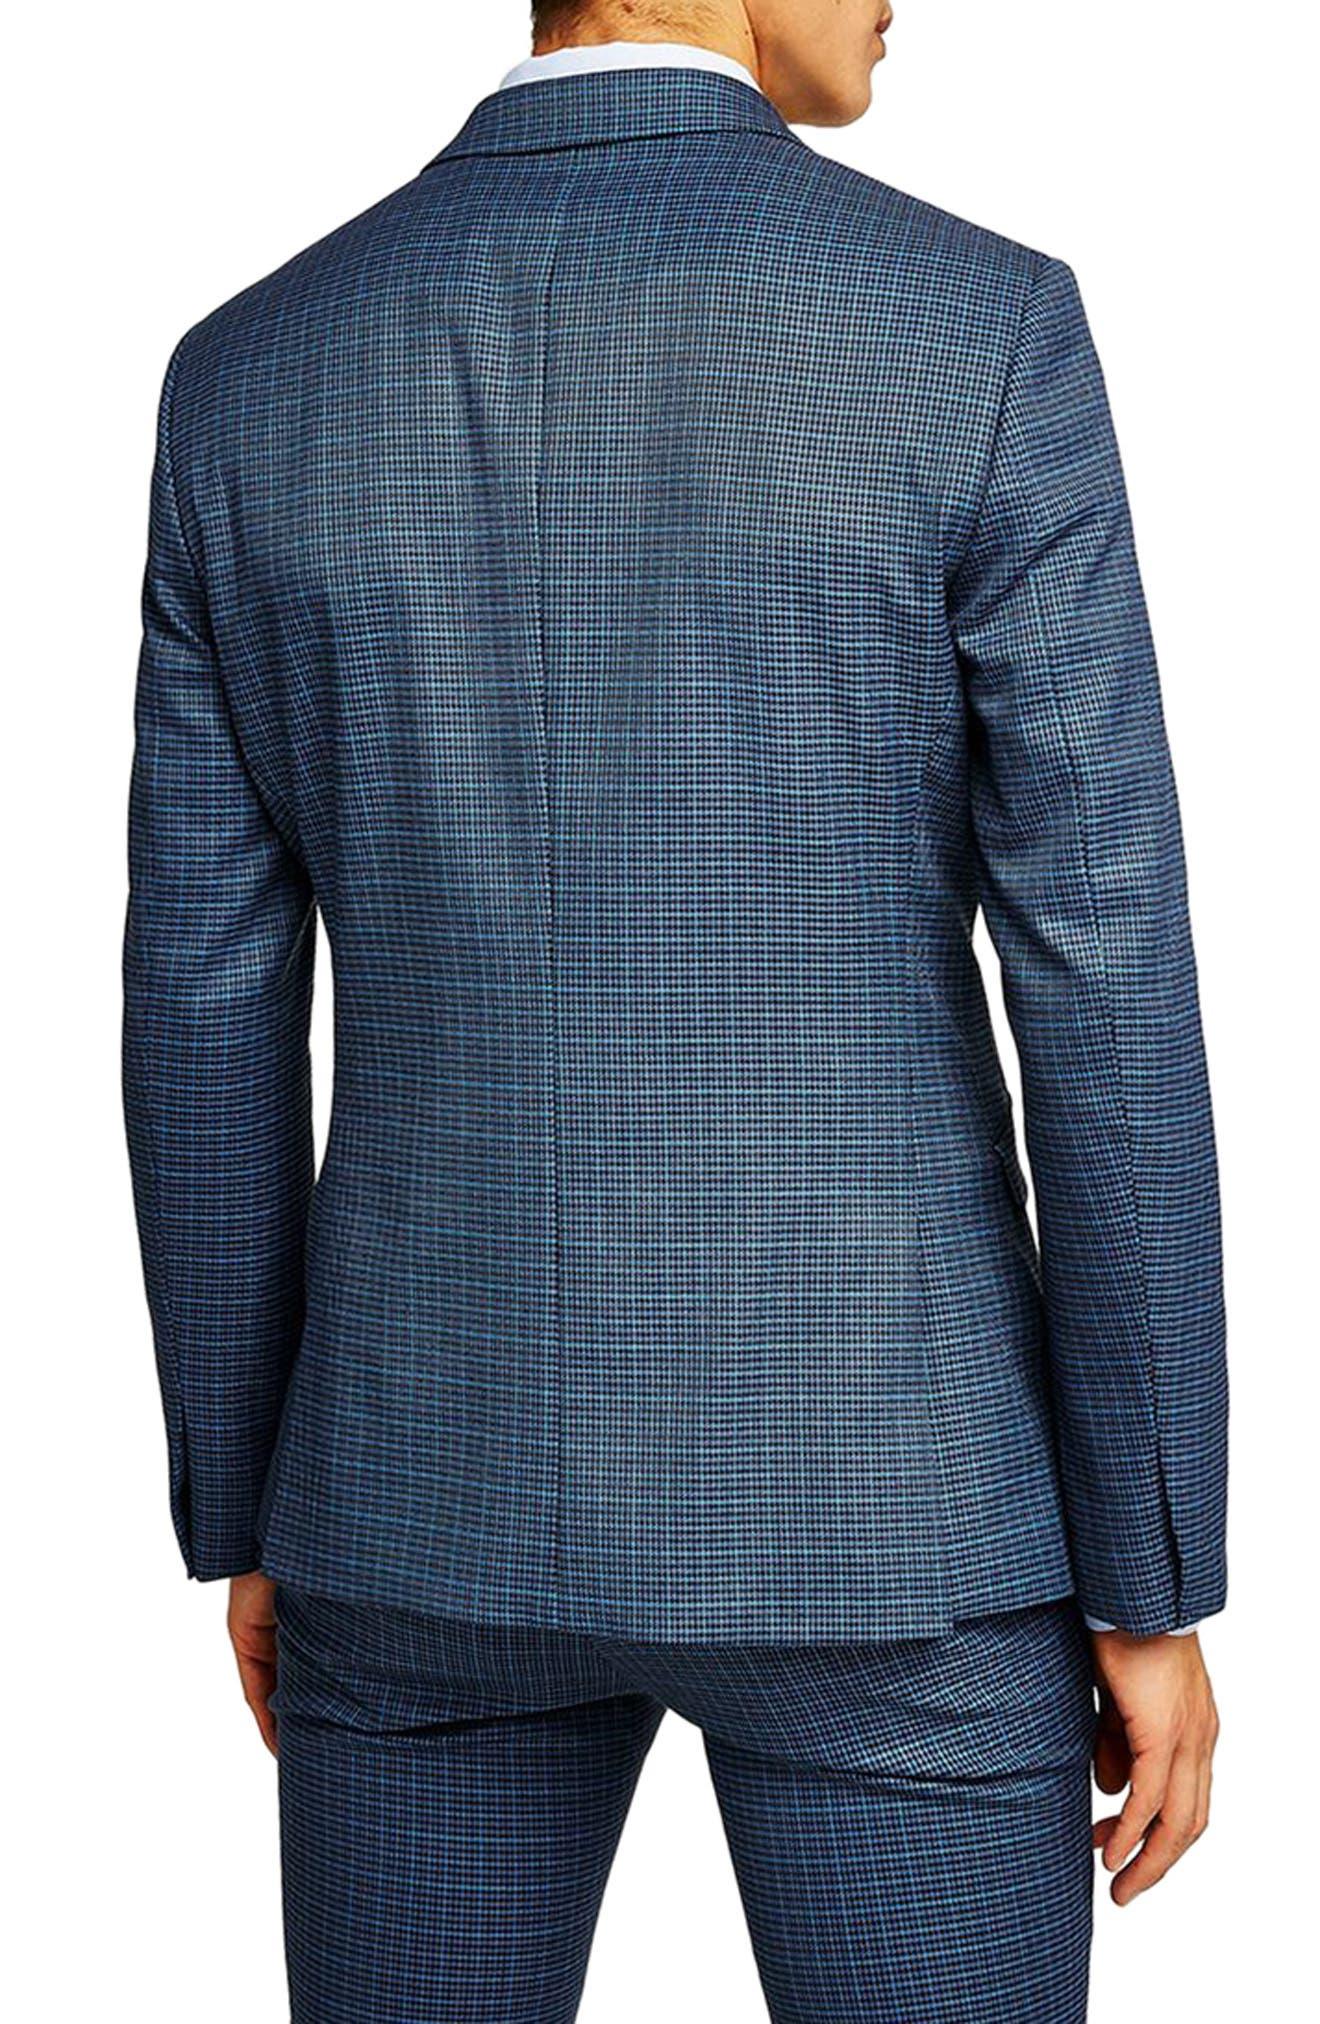 Alternate Image 3  - Topman Check Skinny Fit Suit Jacket